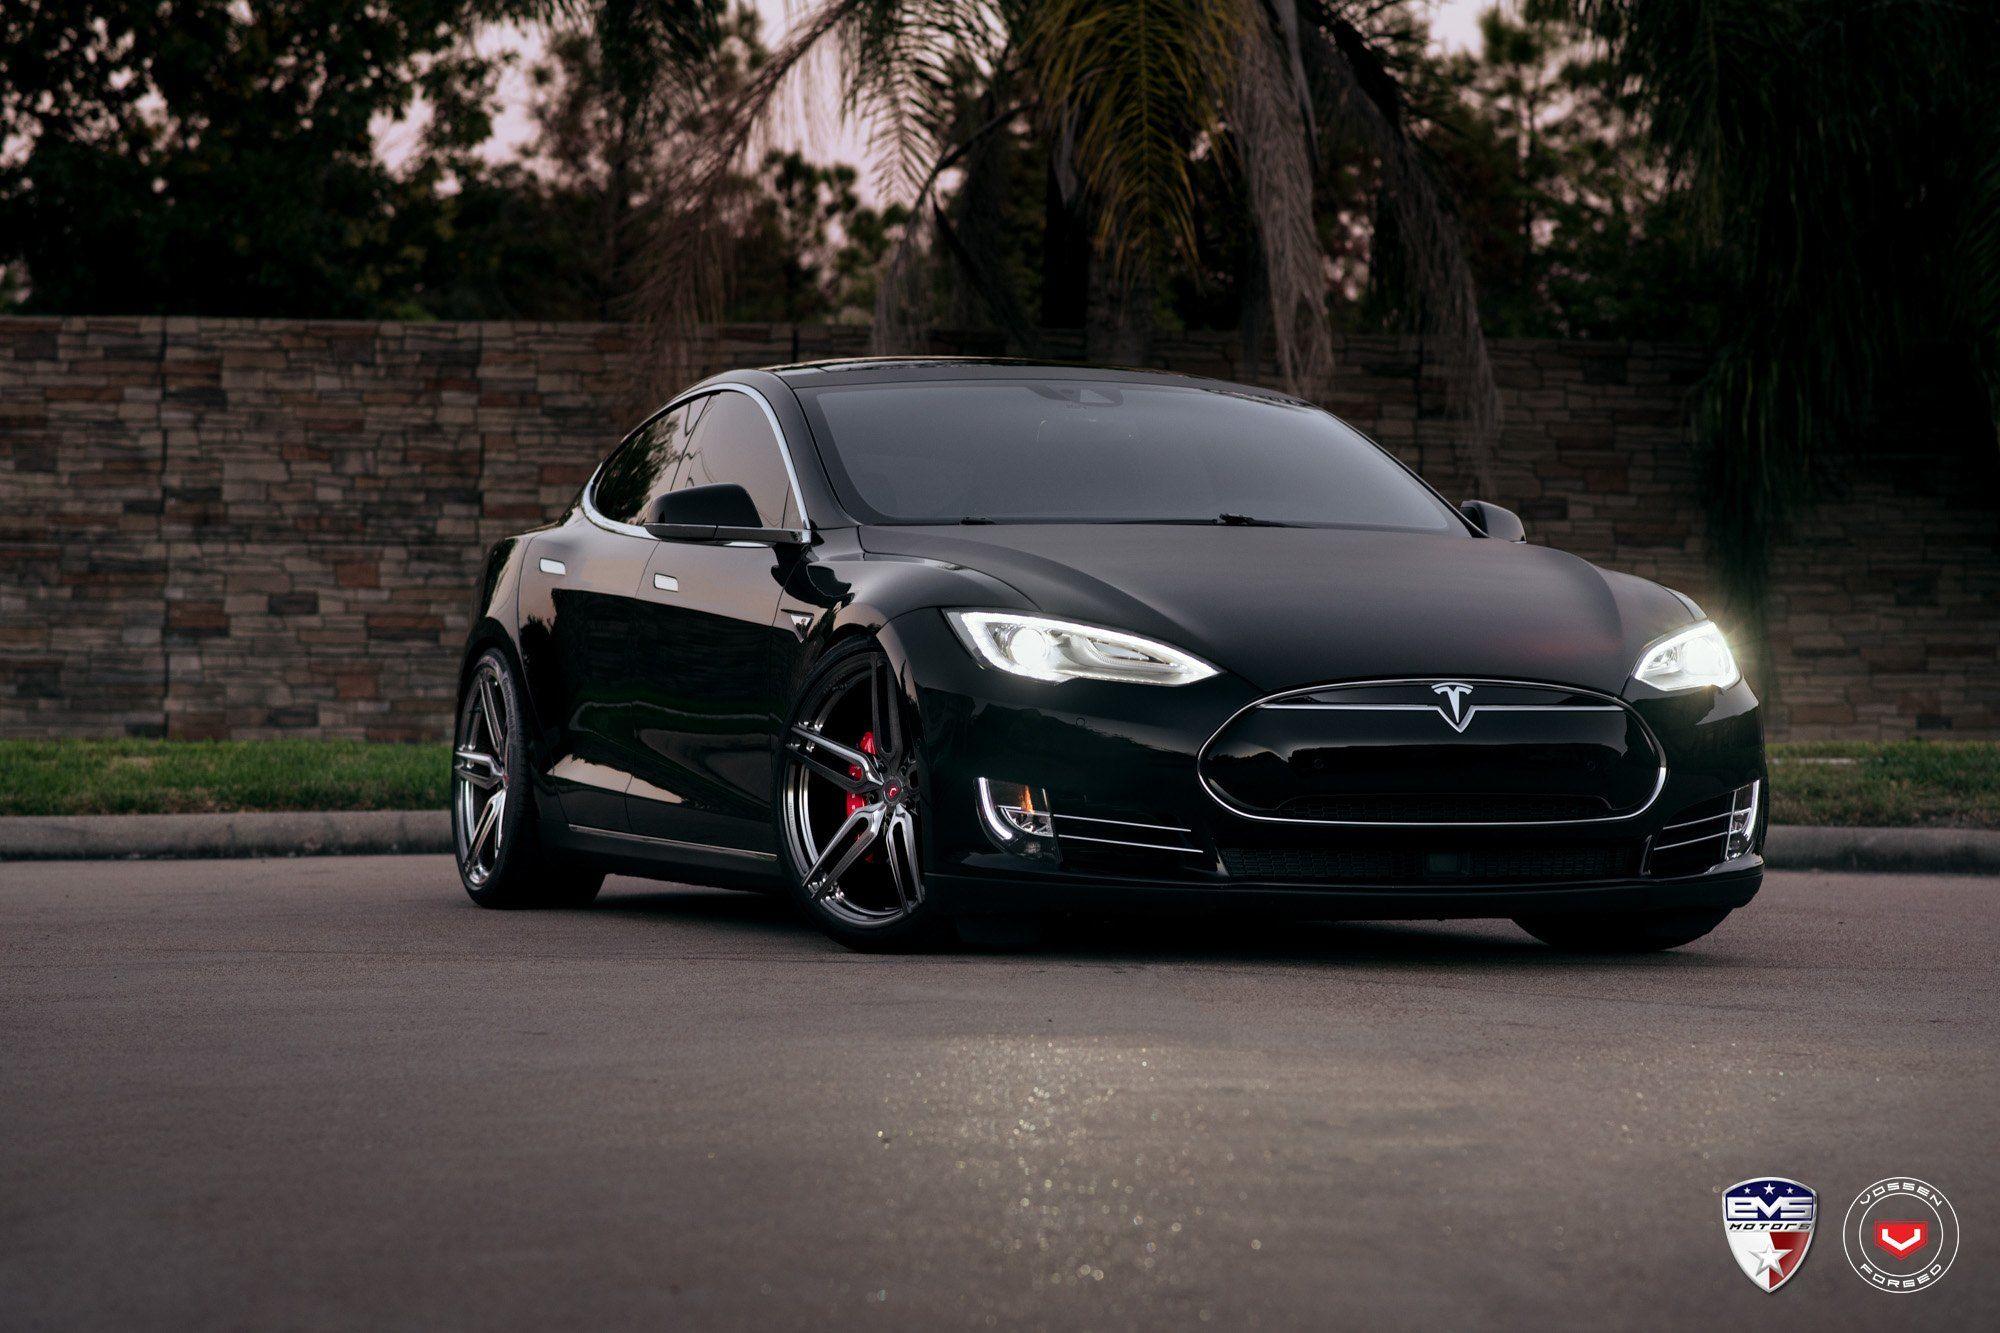 Matte Black Is The New Black Stunning Tesla Model S Transformed Tesla Model S Tesla Model Tesla Model S Black